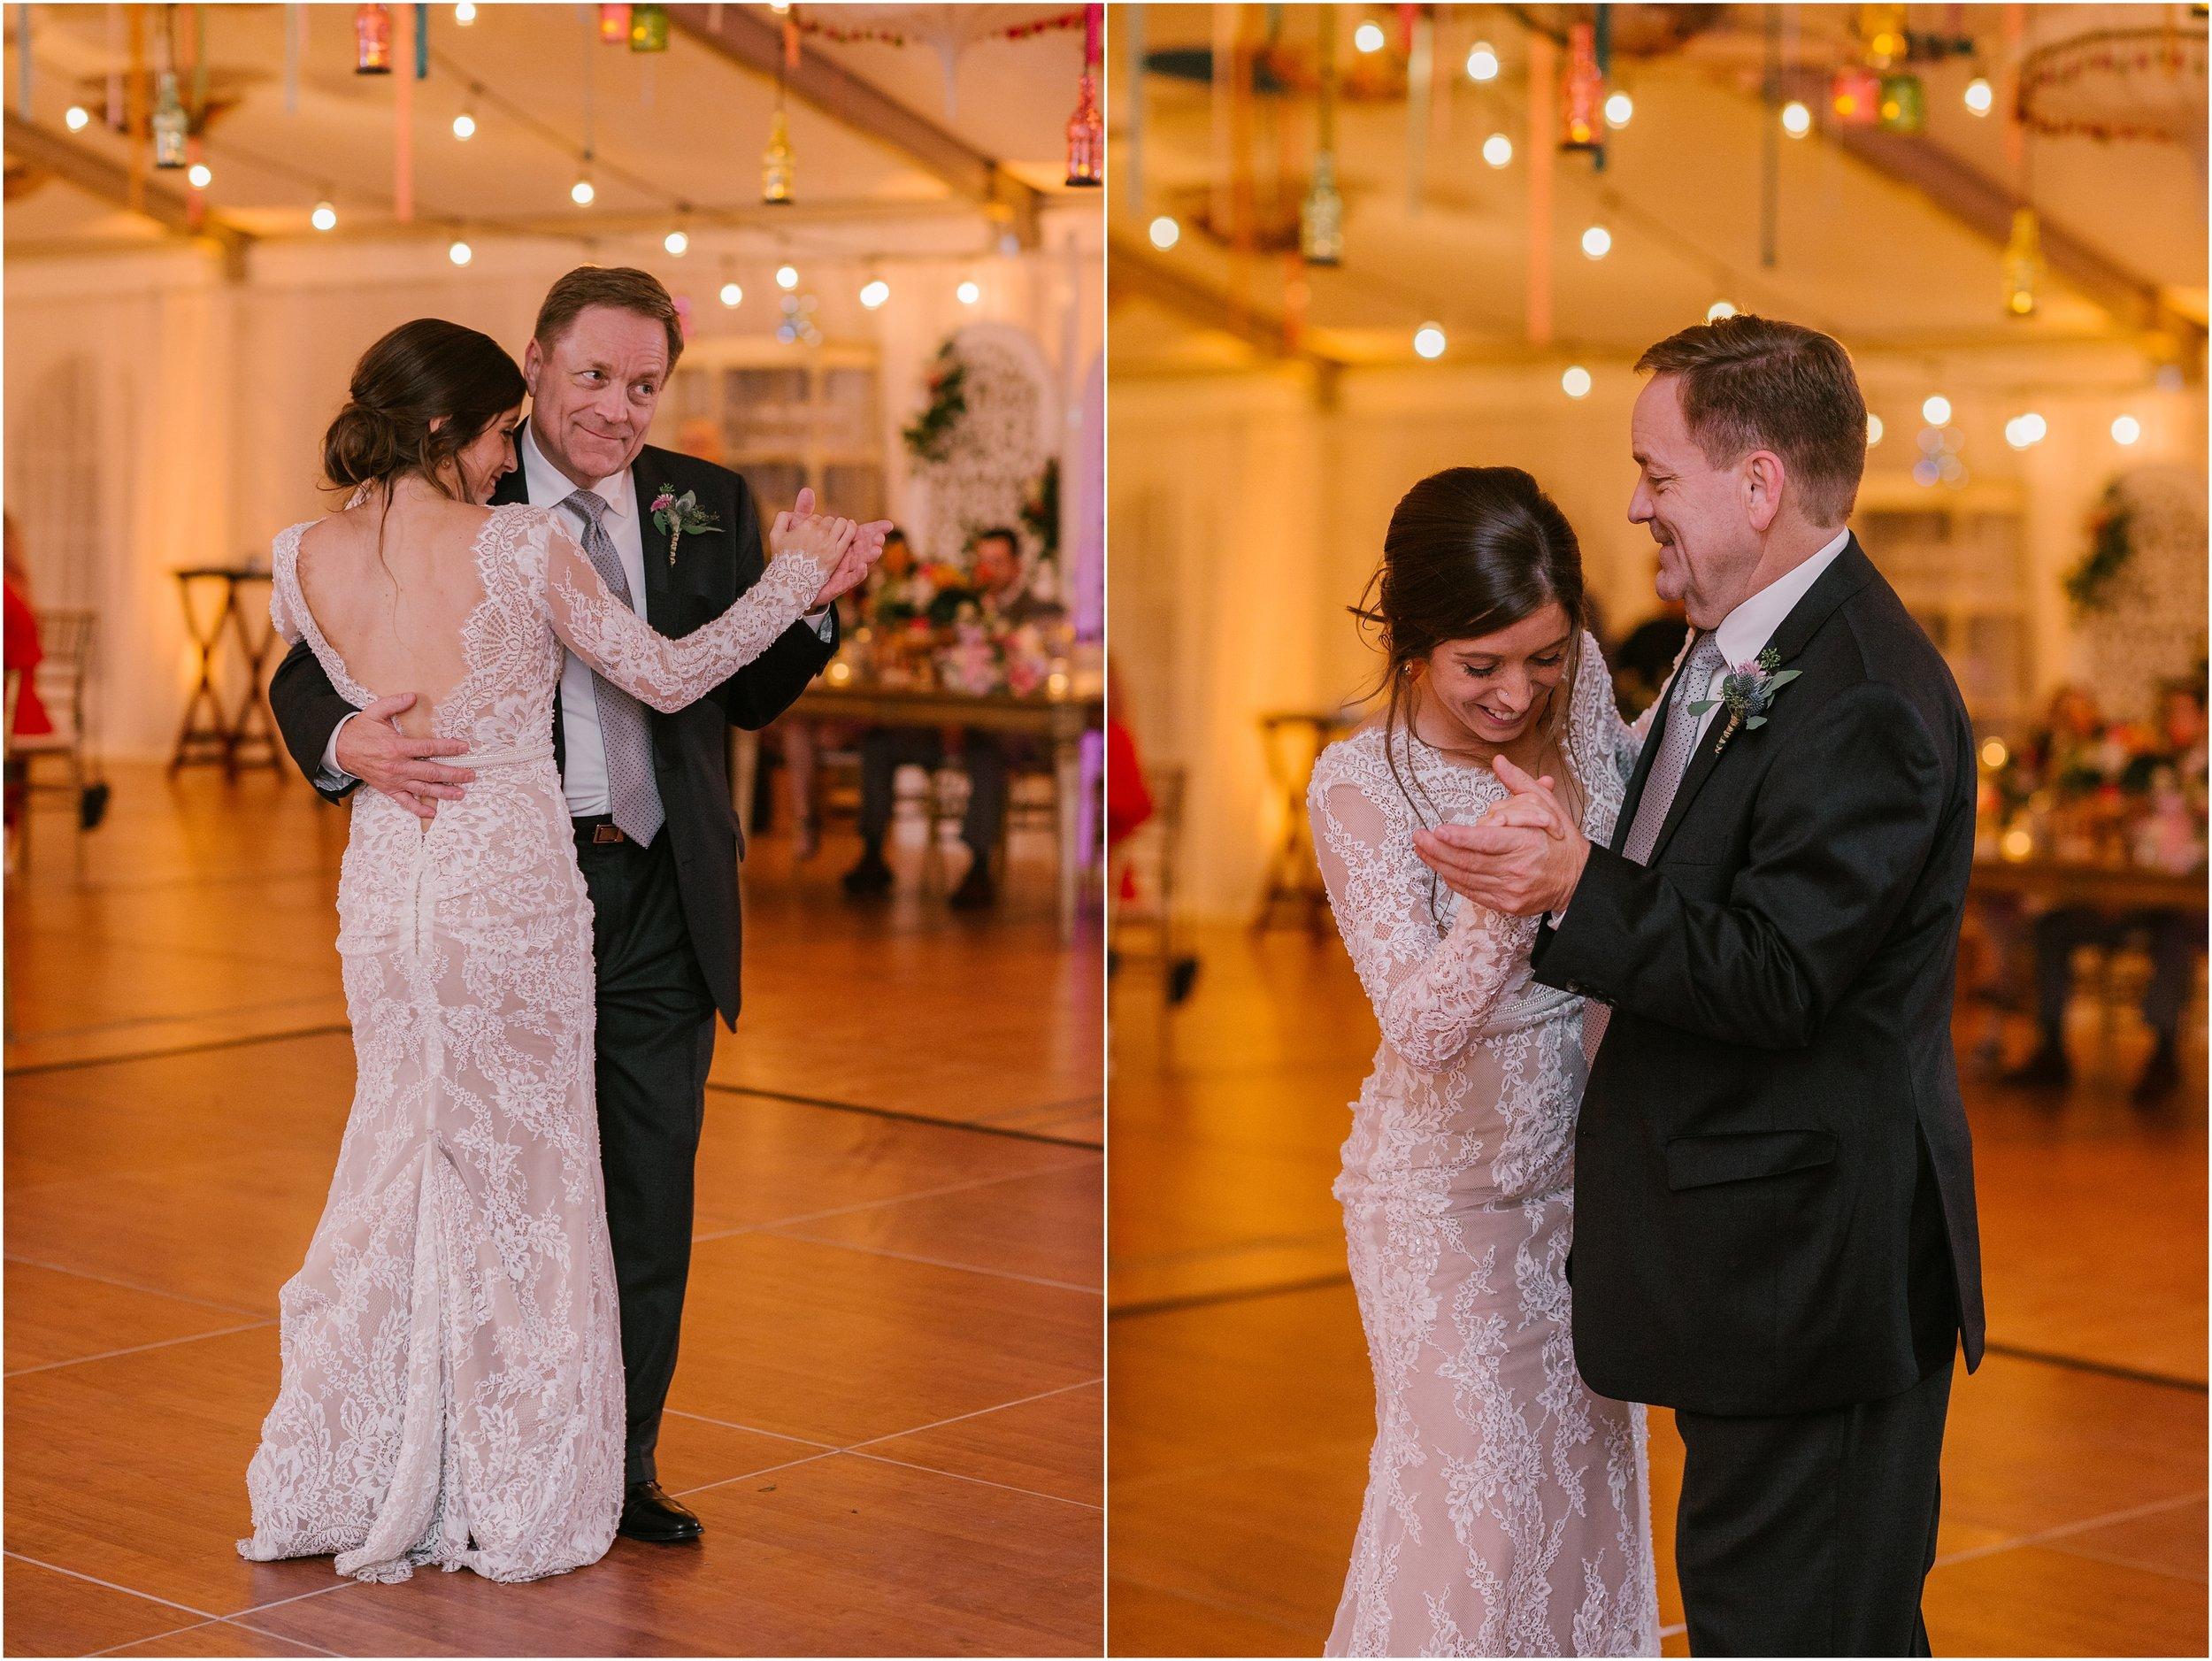 Rebecca_Shehorn_Photography_Indianapolis_Wedding_Photographer_9291.jpg